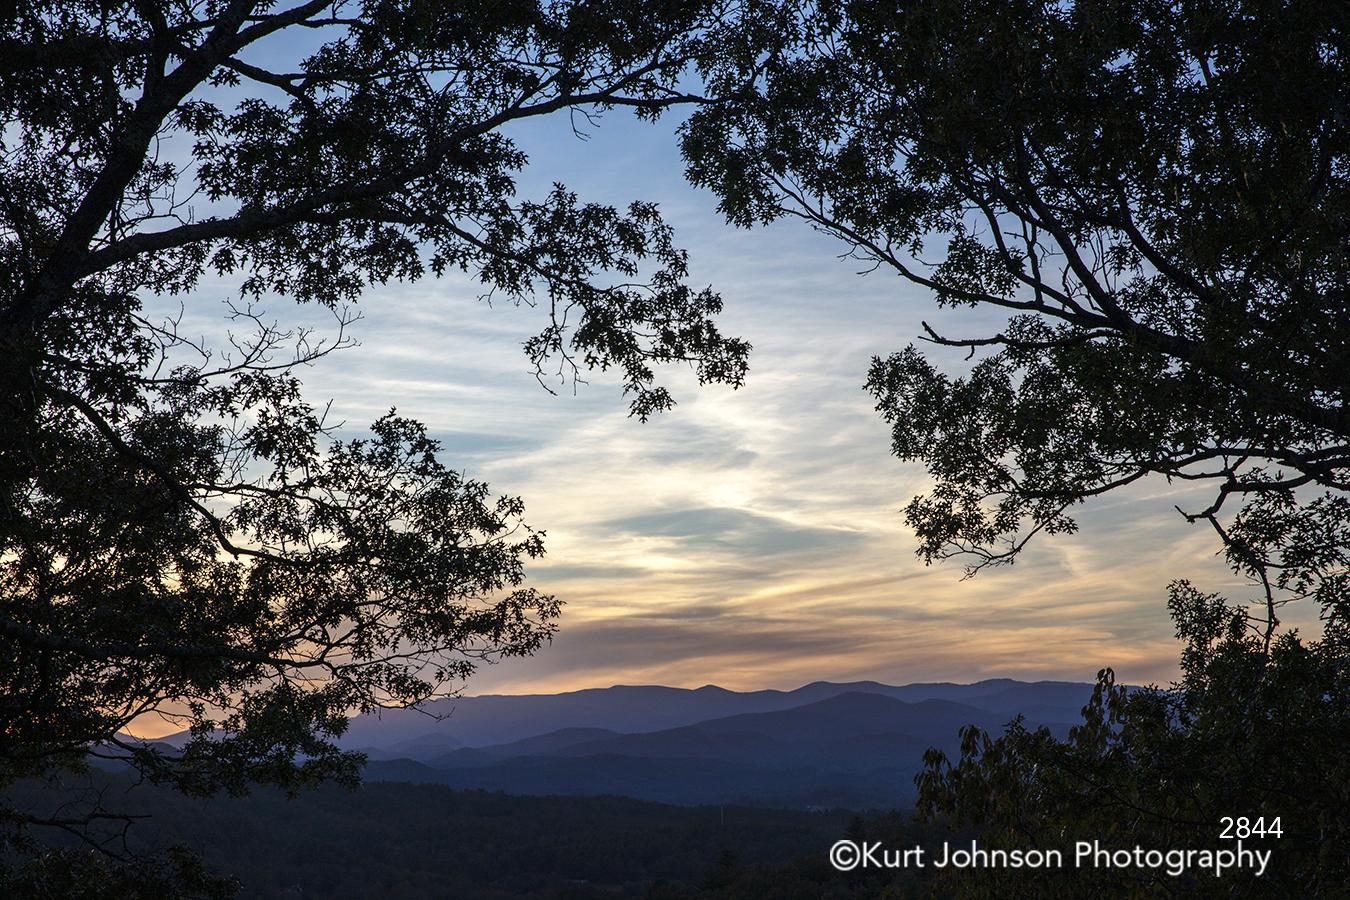 trees shadows silhouette blue sky sunset horizon landscape